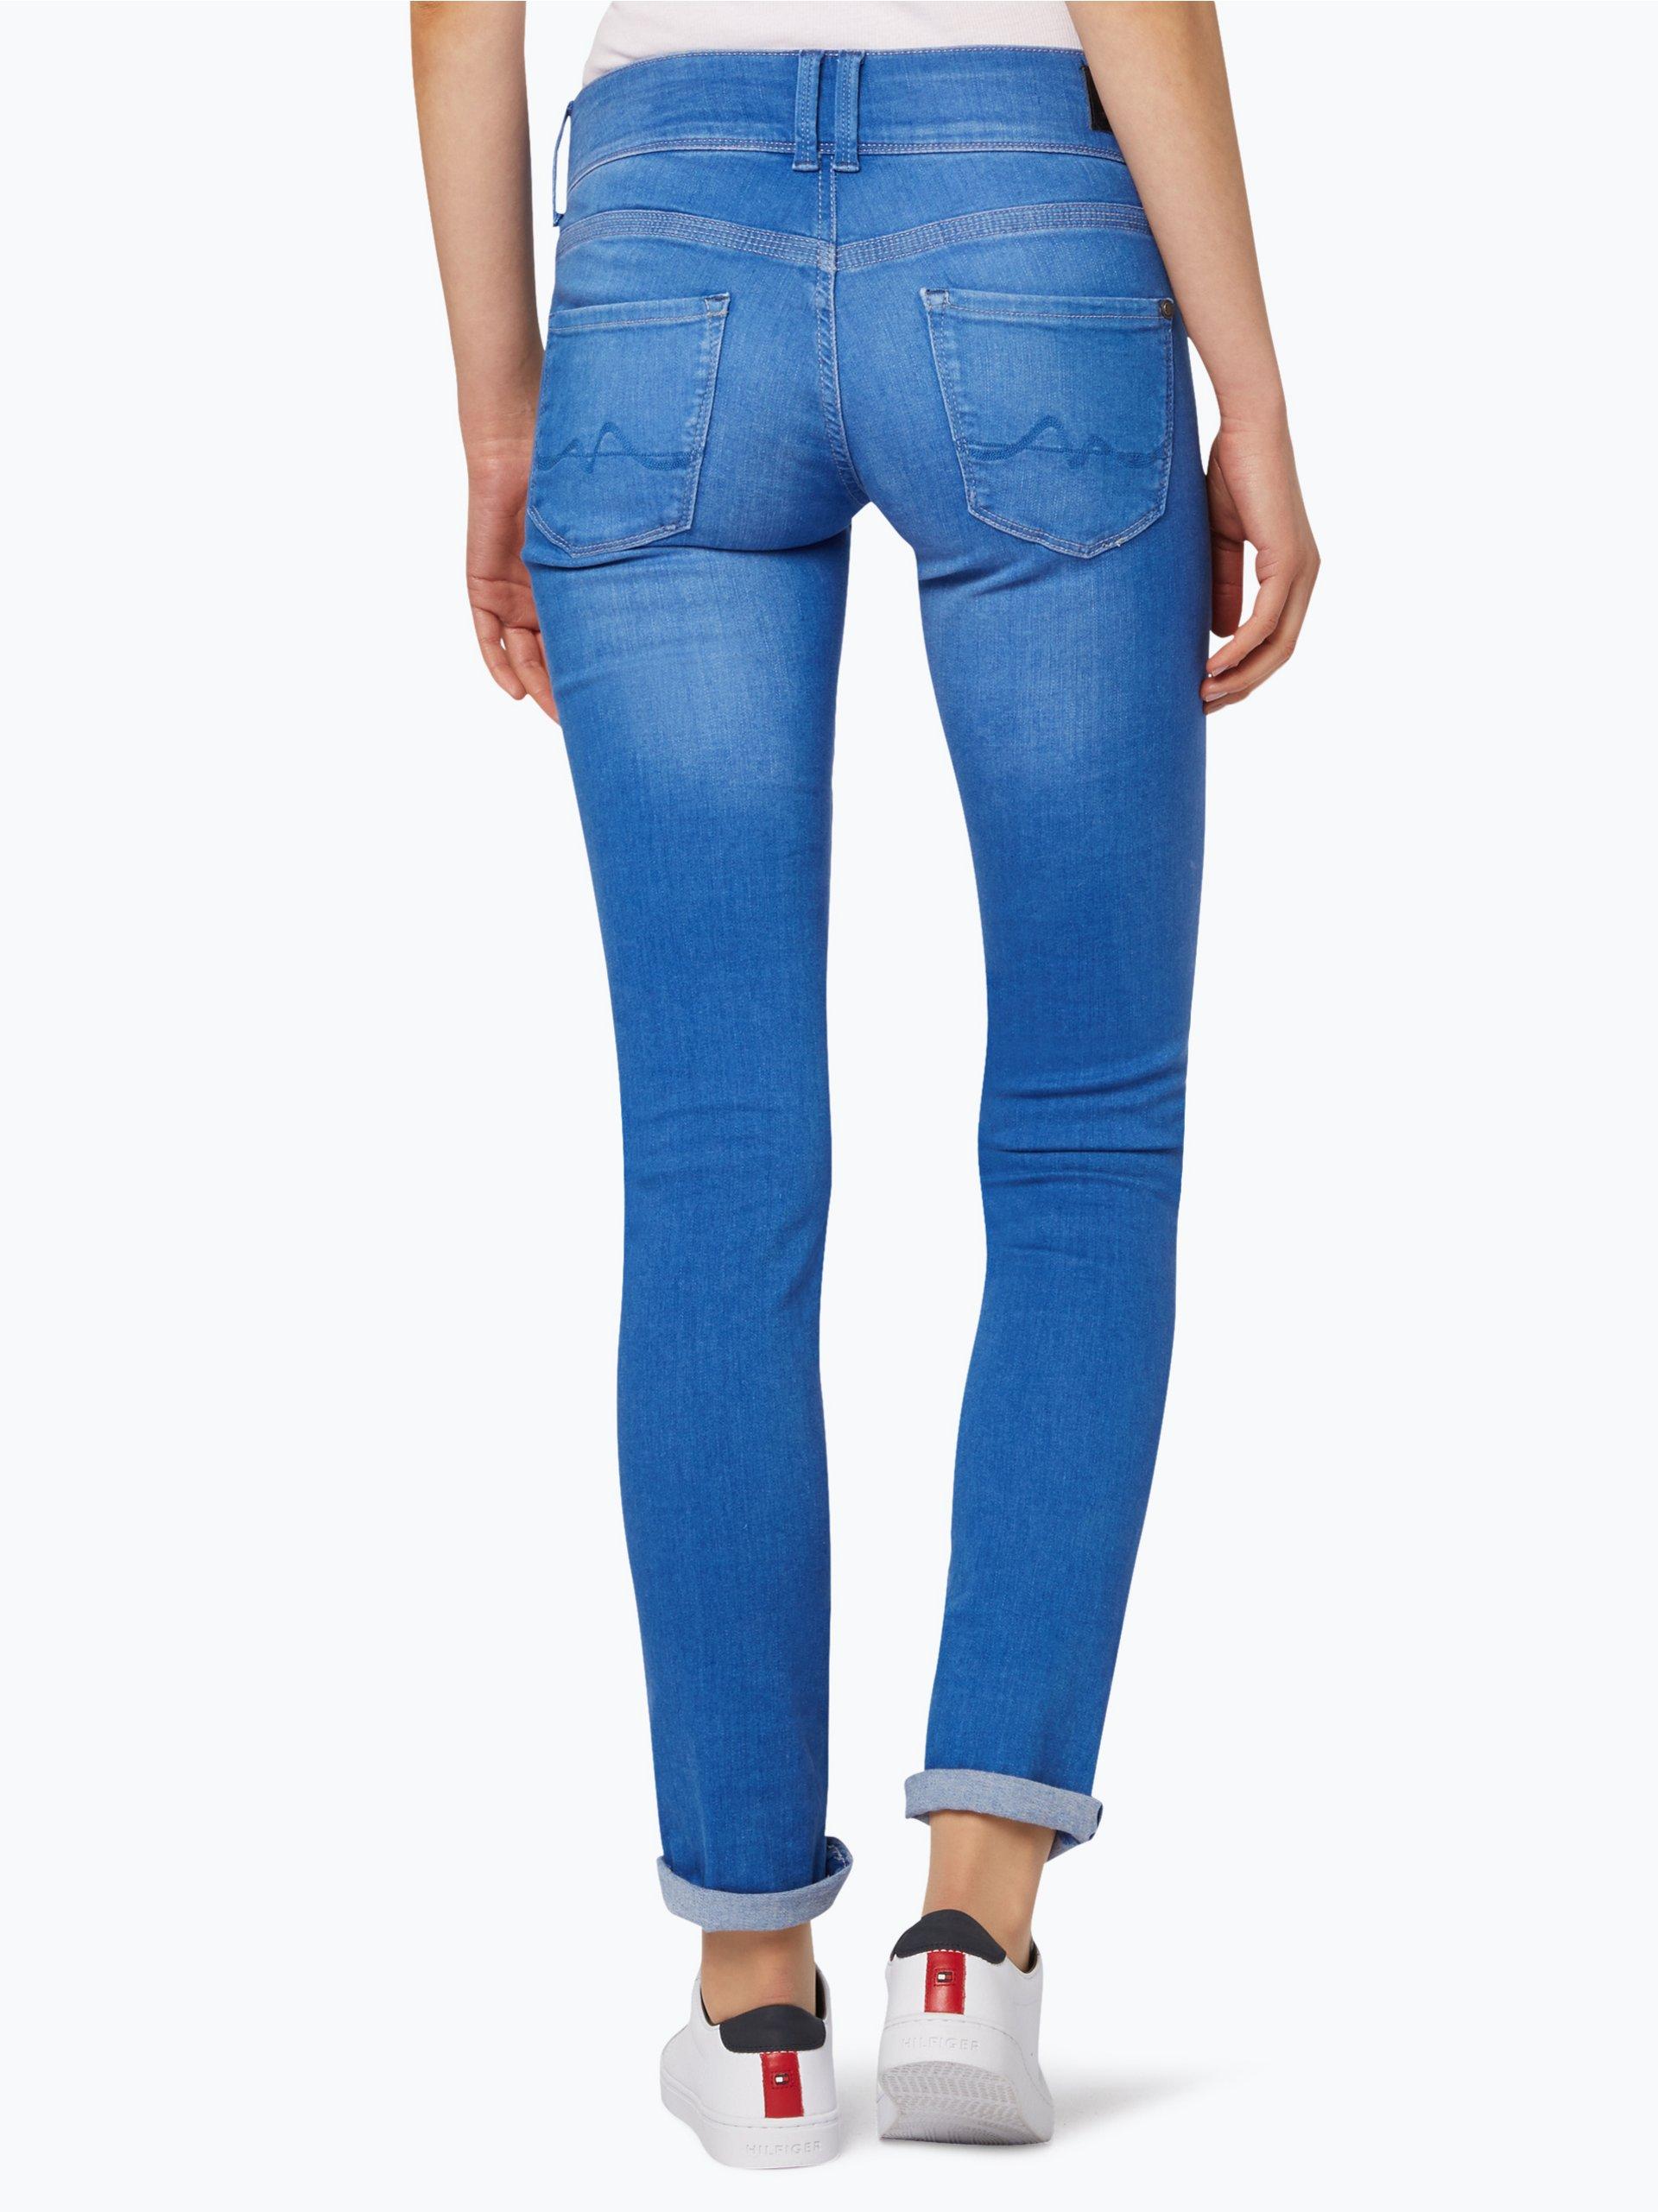 pepe jeans damen jeans vera blau uni online kaufen peek und cloppenburg de. Black Bedroom Furniture Sets. Home Design Ideas